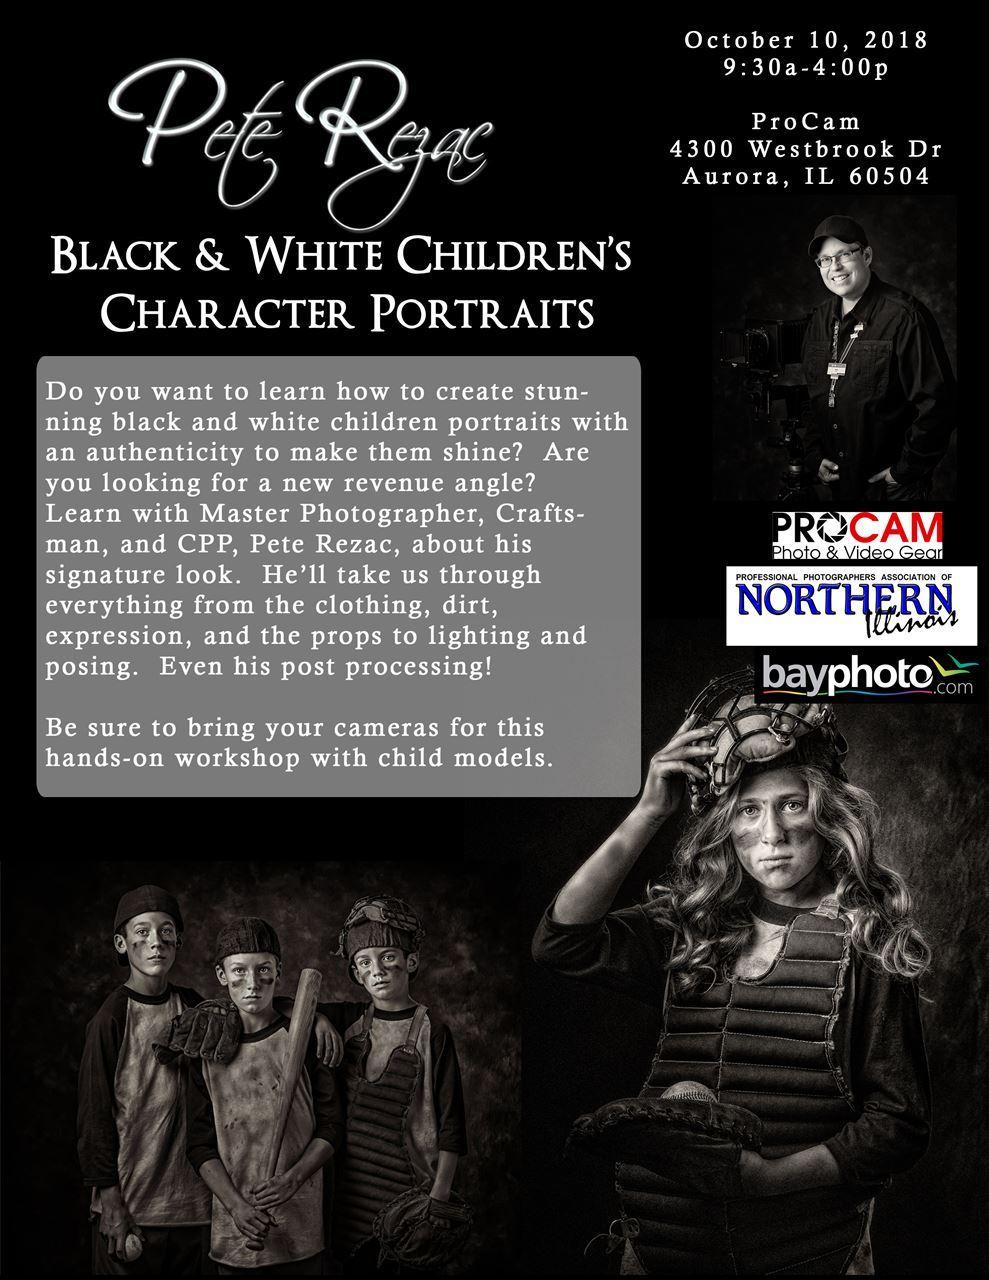 Professional Photographers Association of Northern Illinois